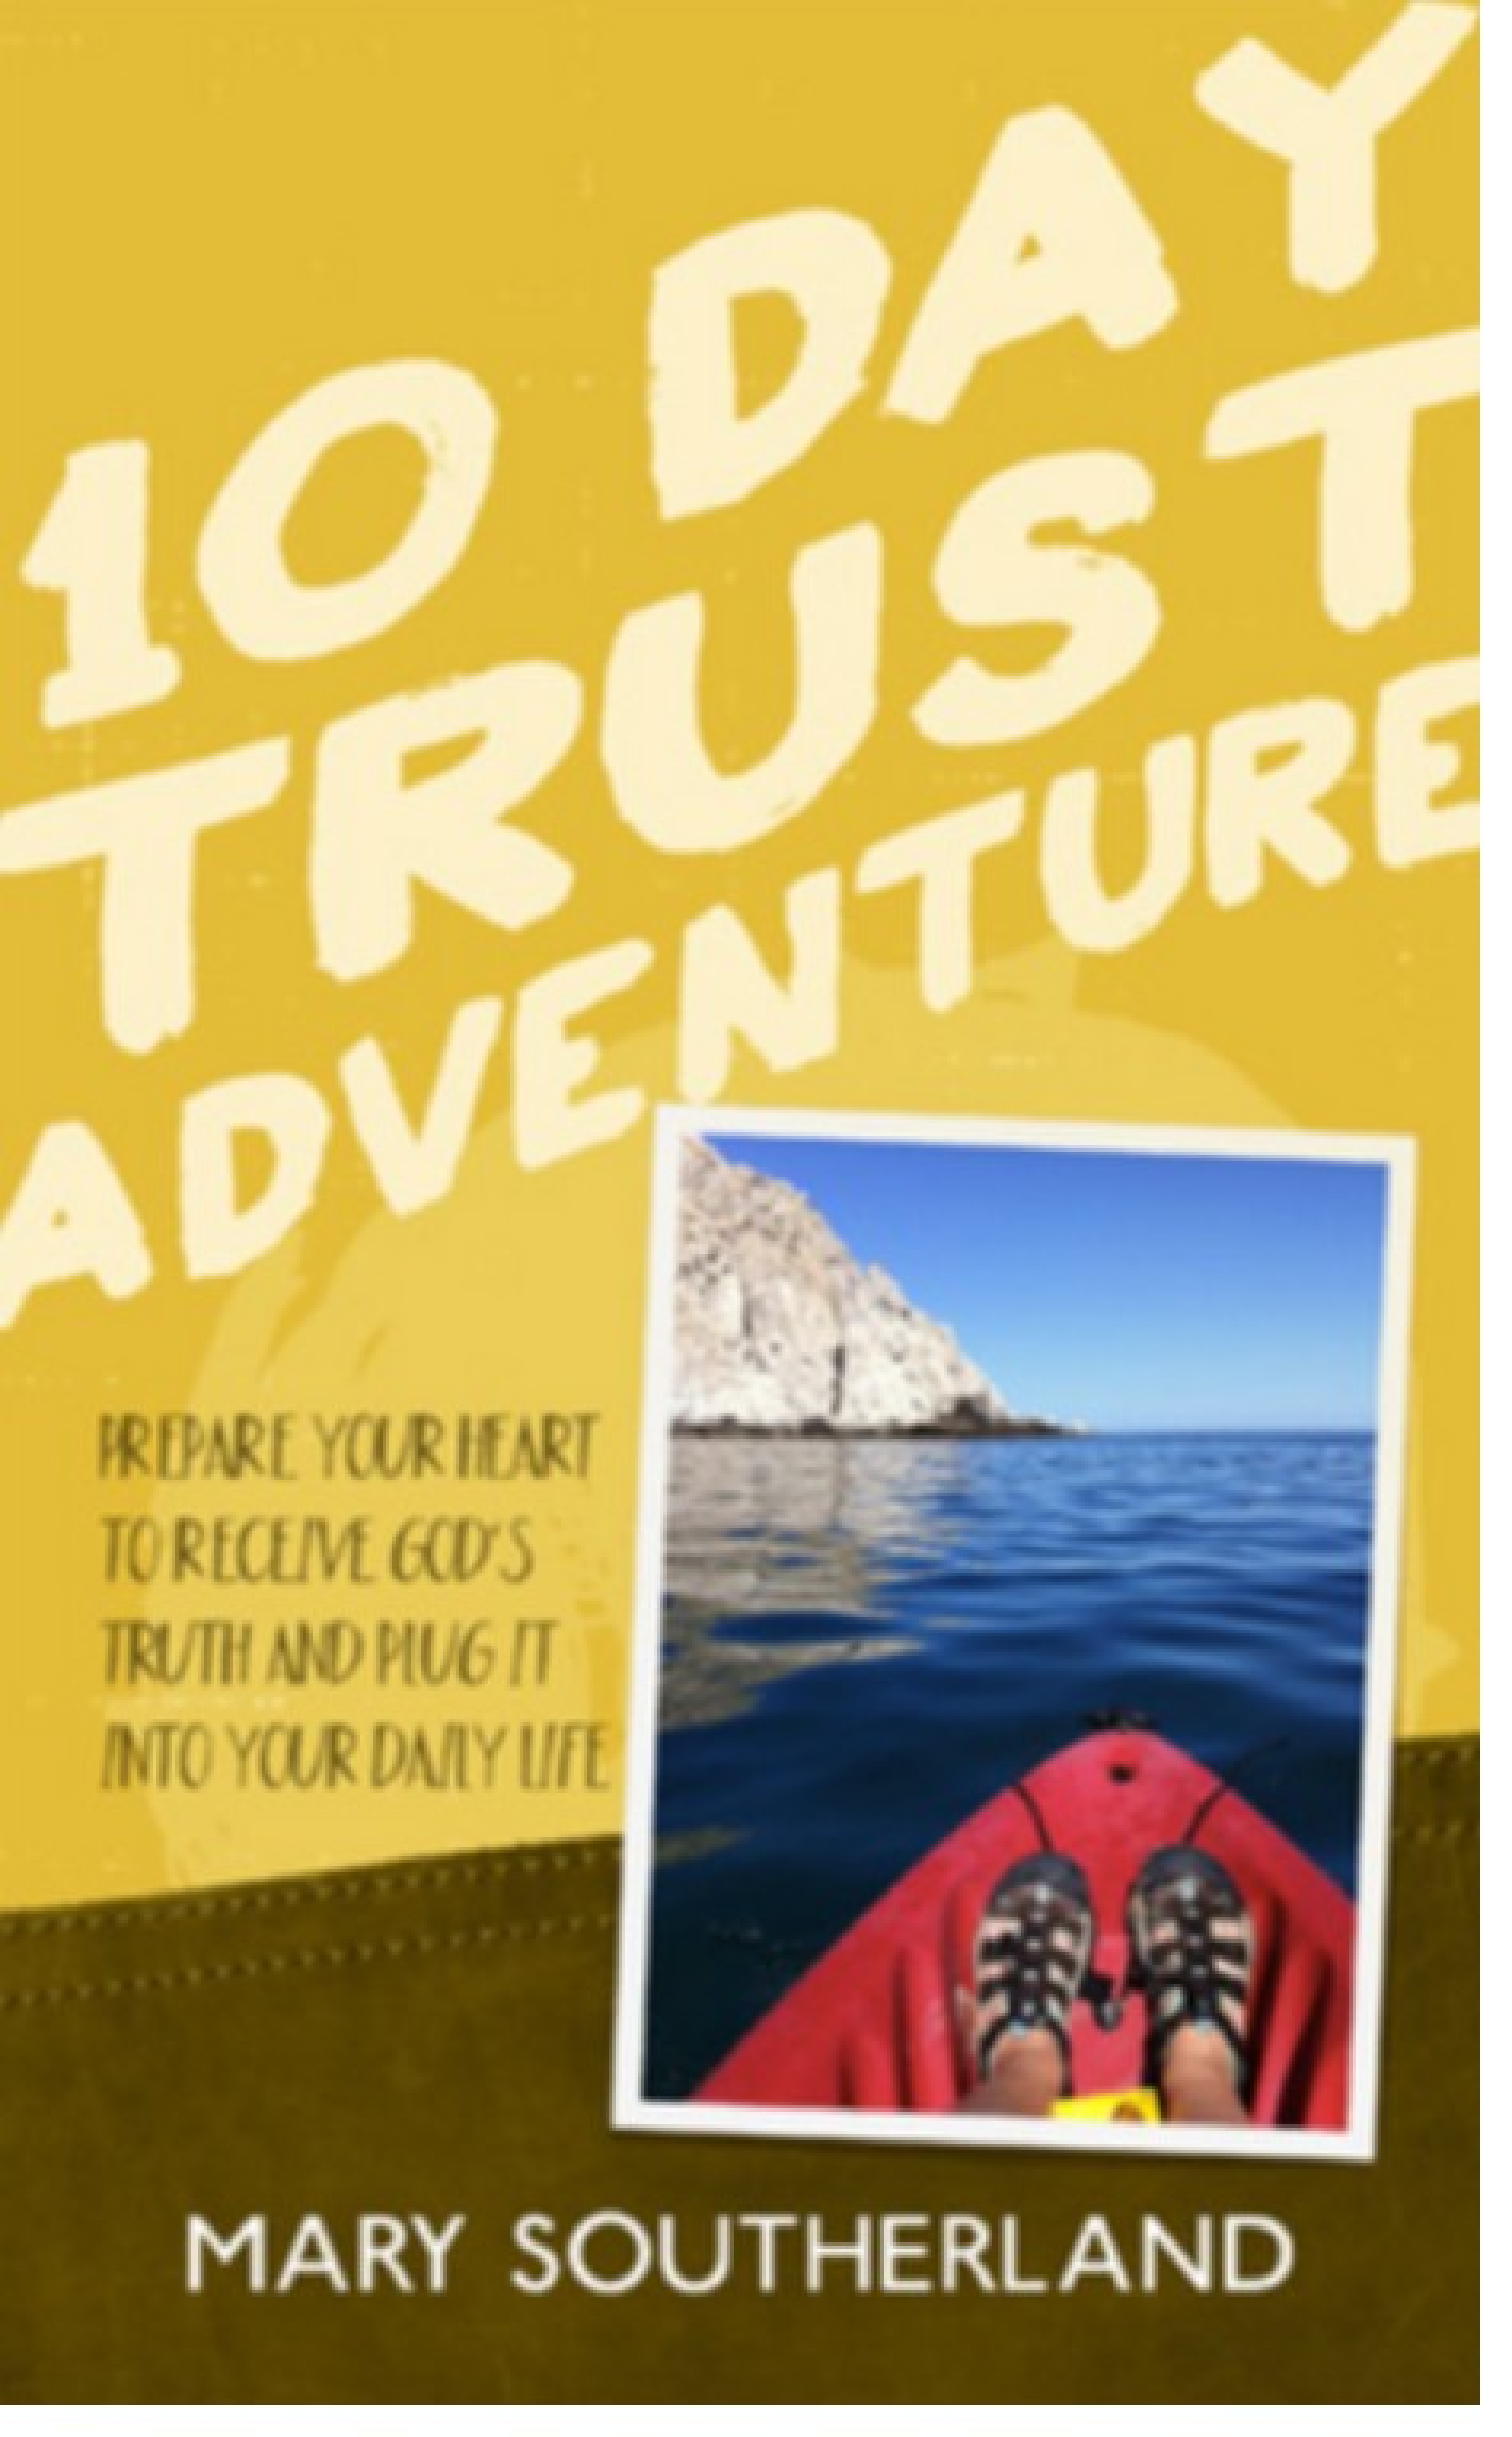 Gig-Trust-Adventure